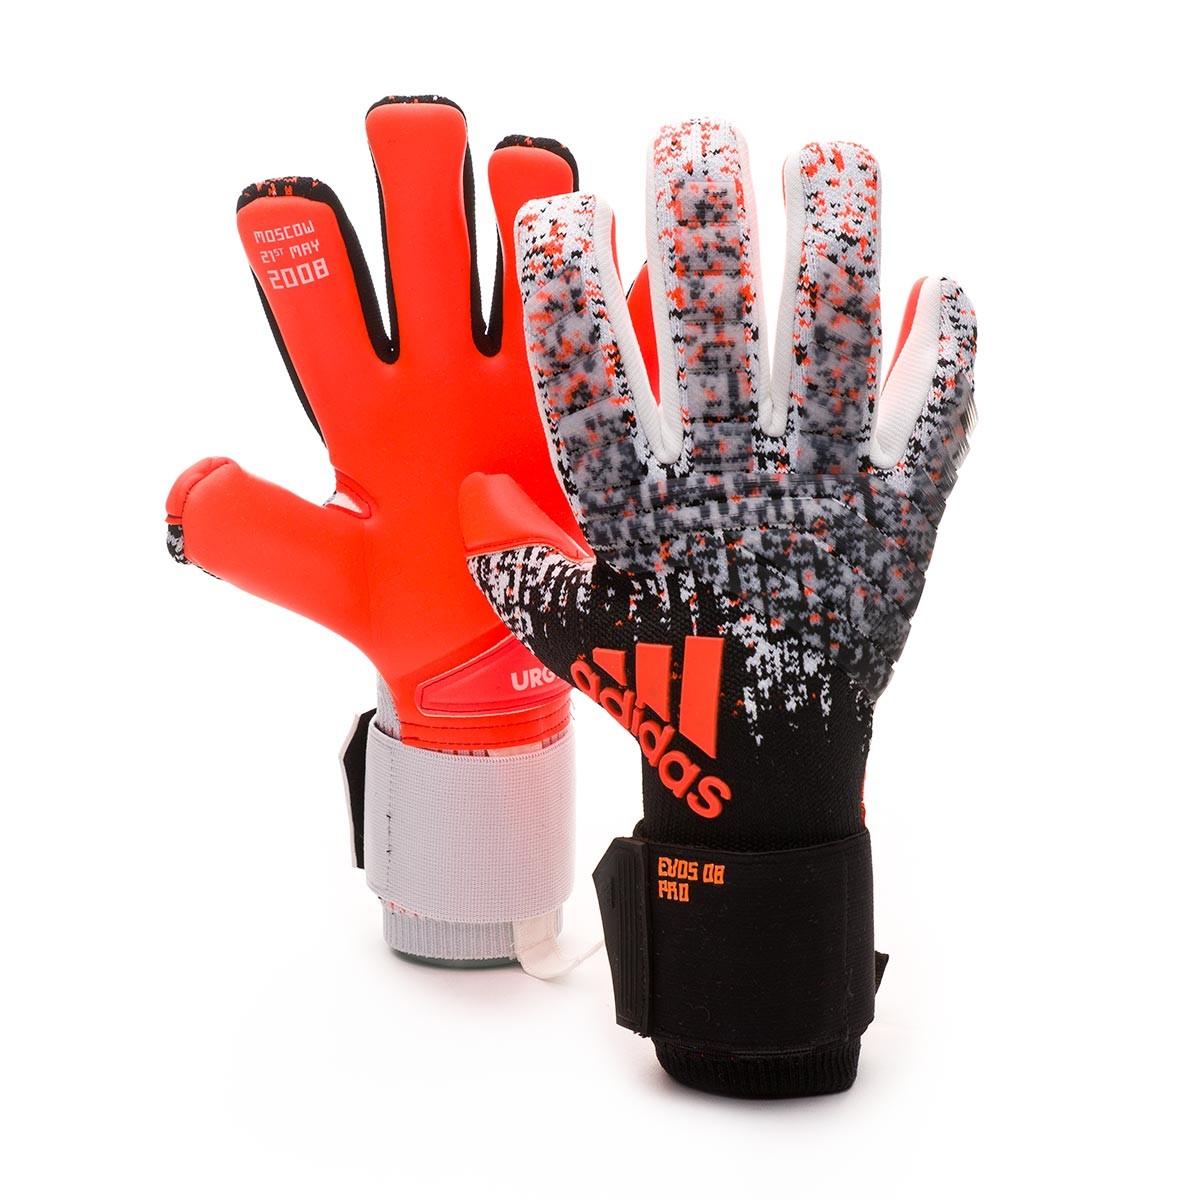 adidas Predator Pro EVDS08 Glove